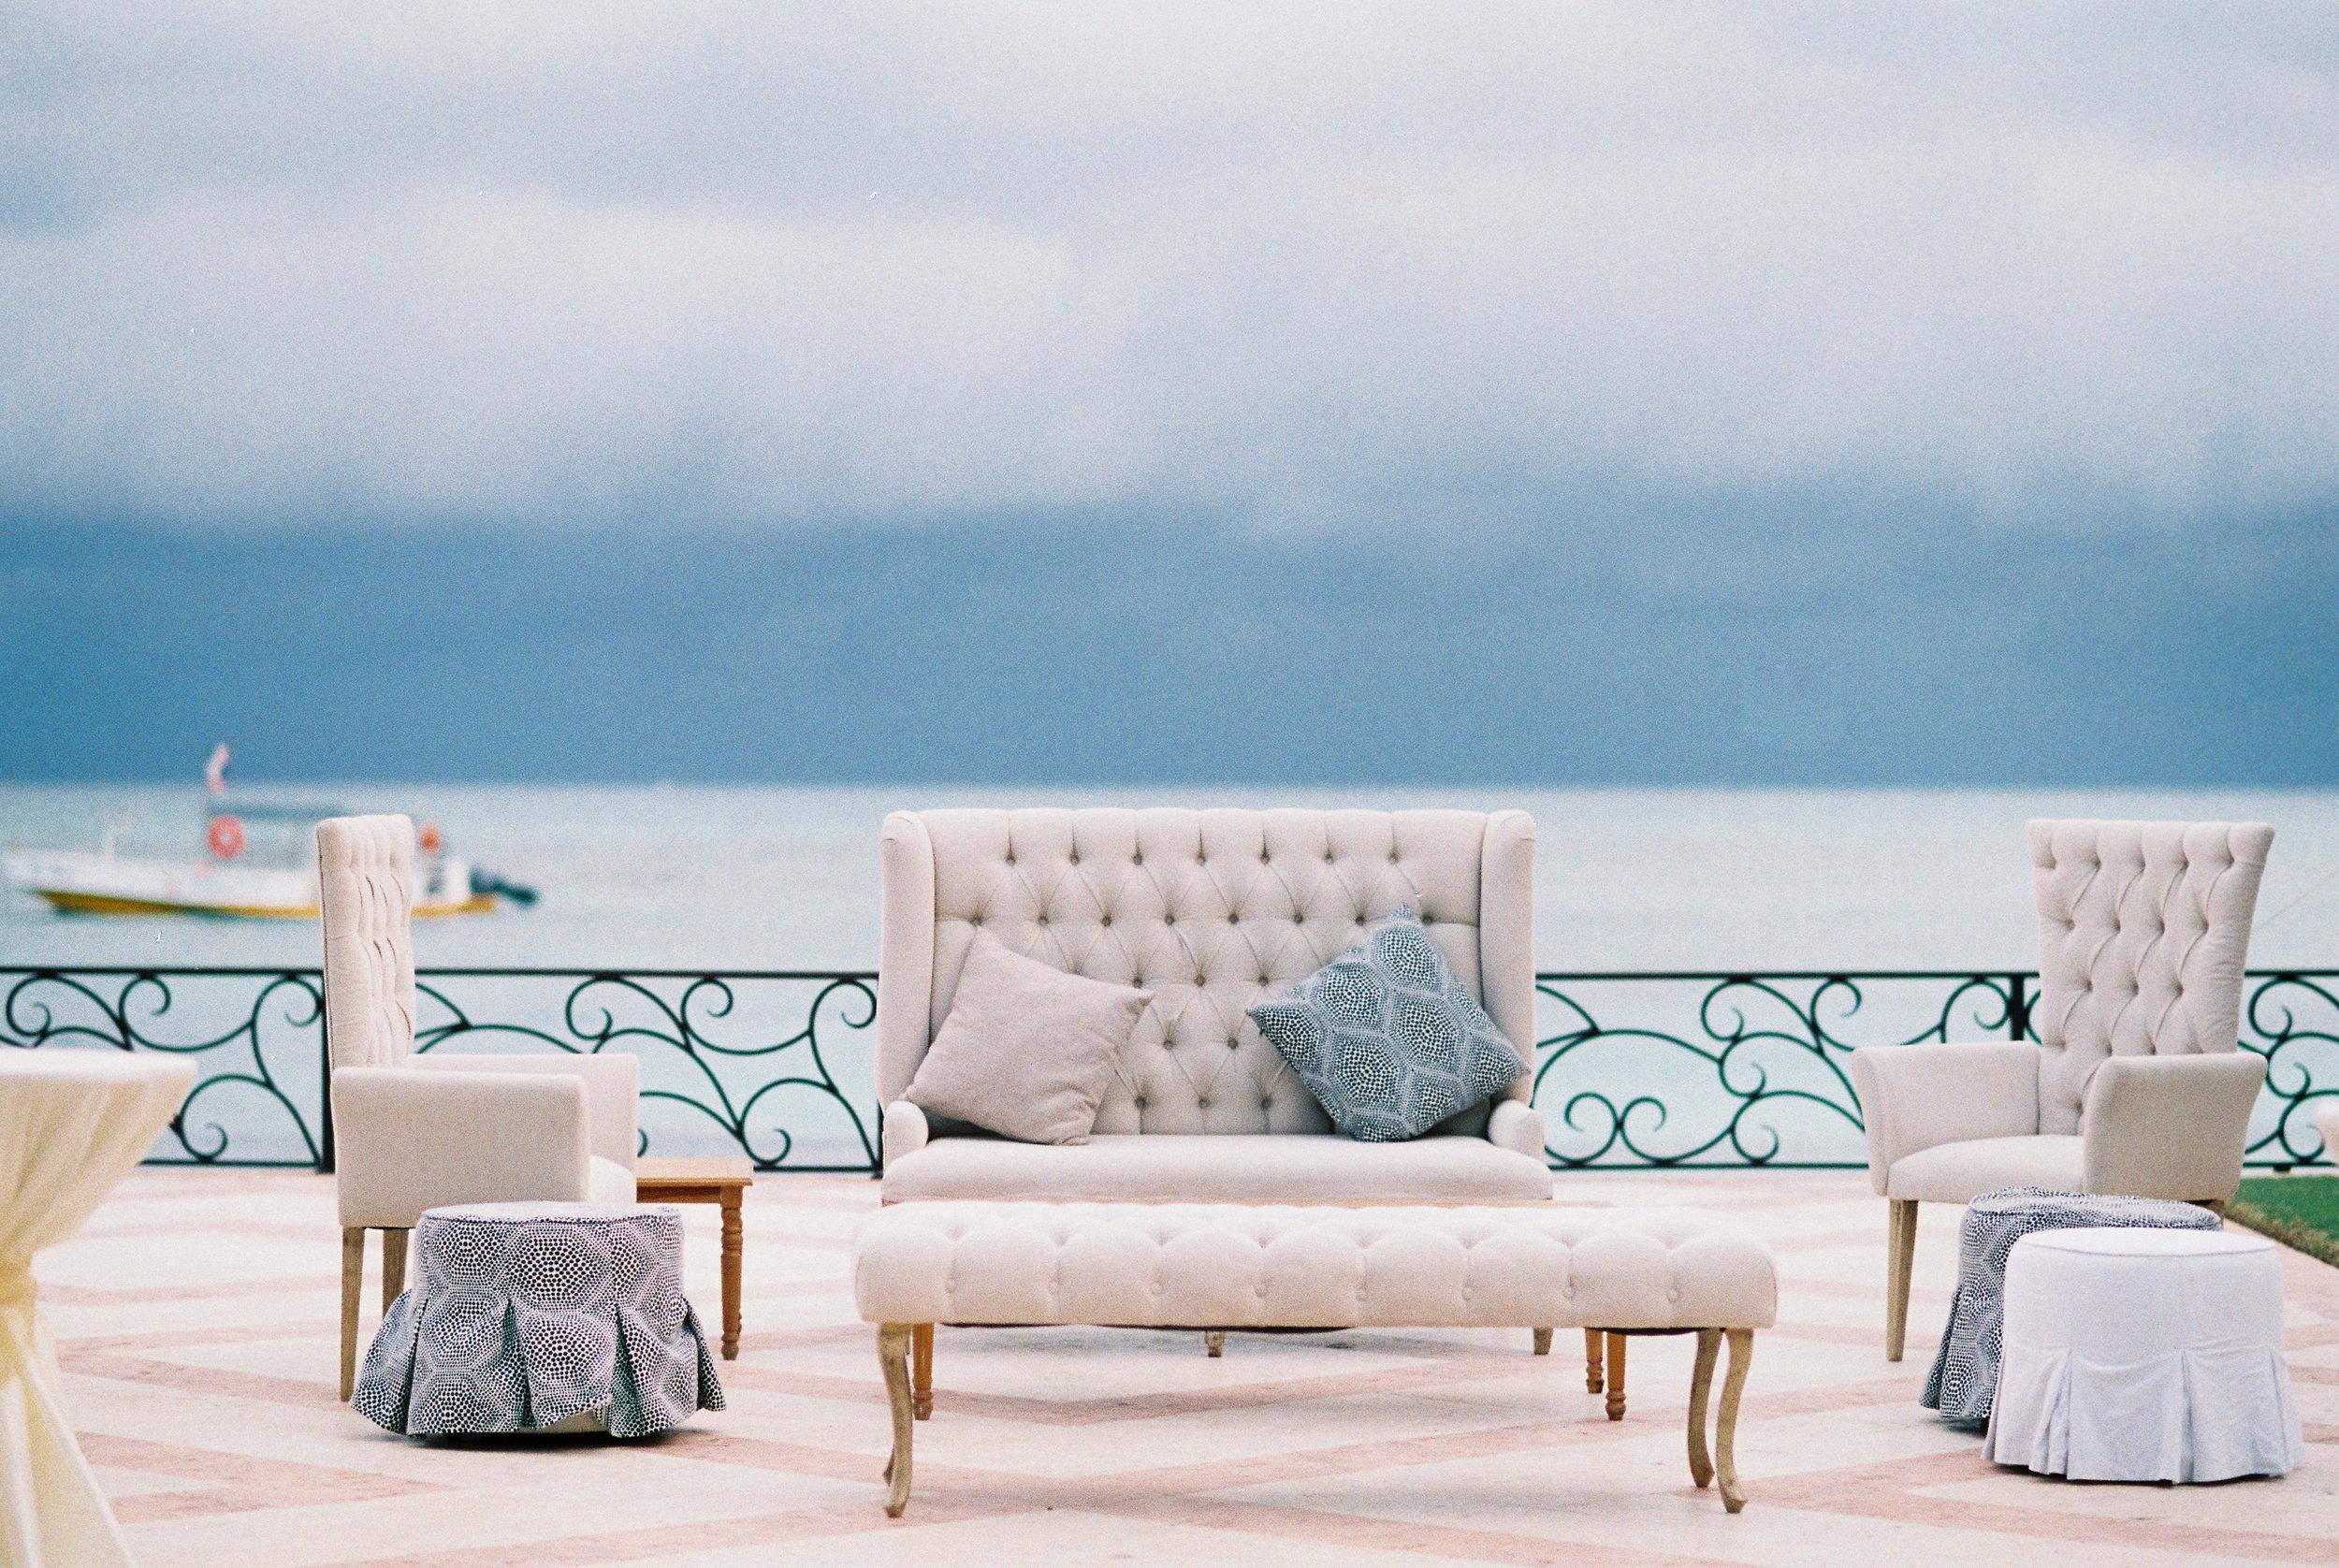 mexico_destination_wedding_villa_la_joya_cancun_49.jpg